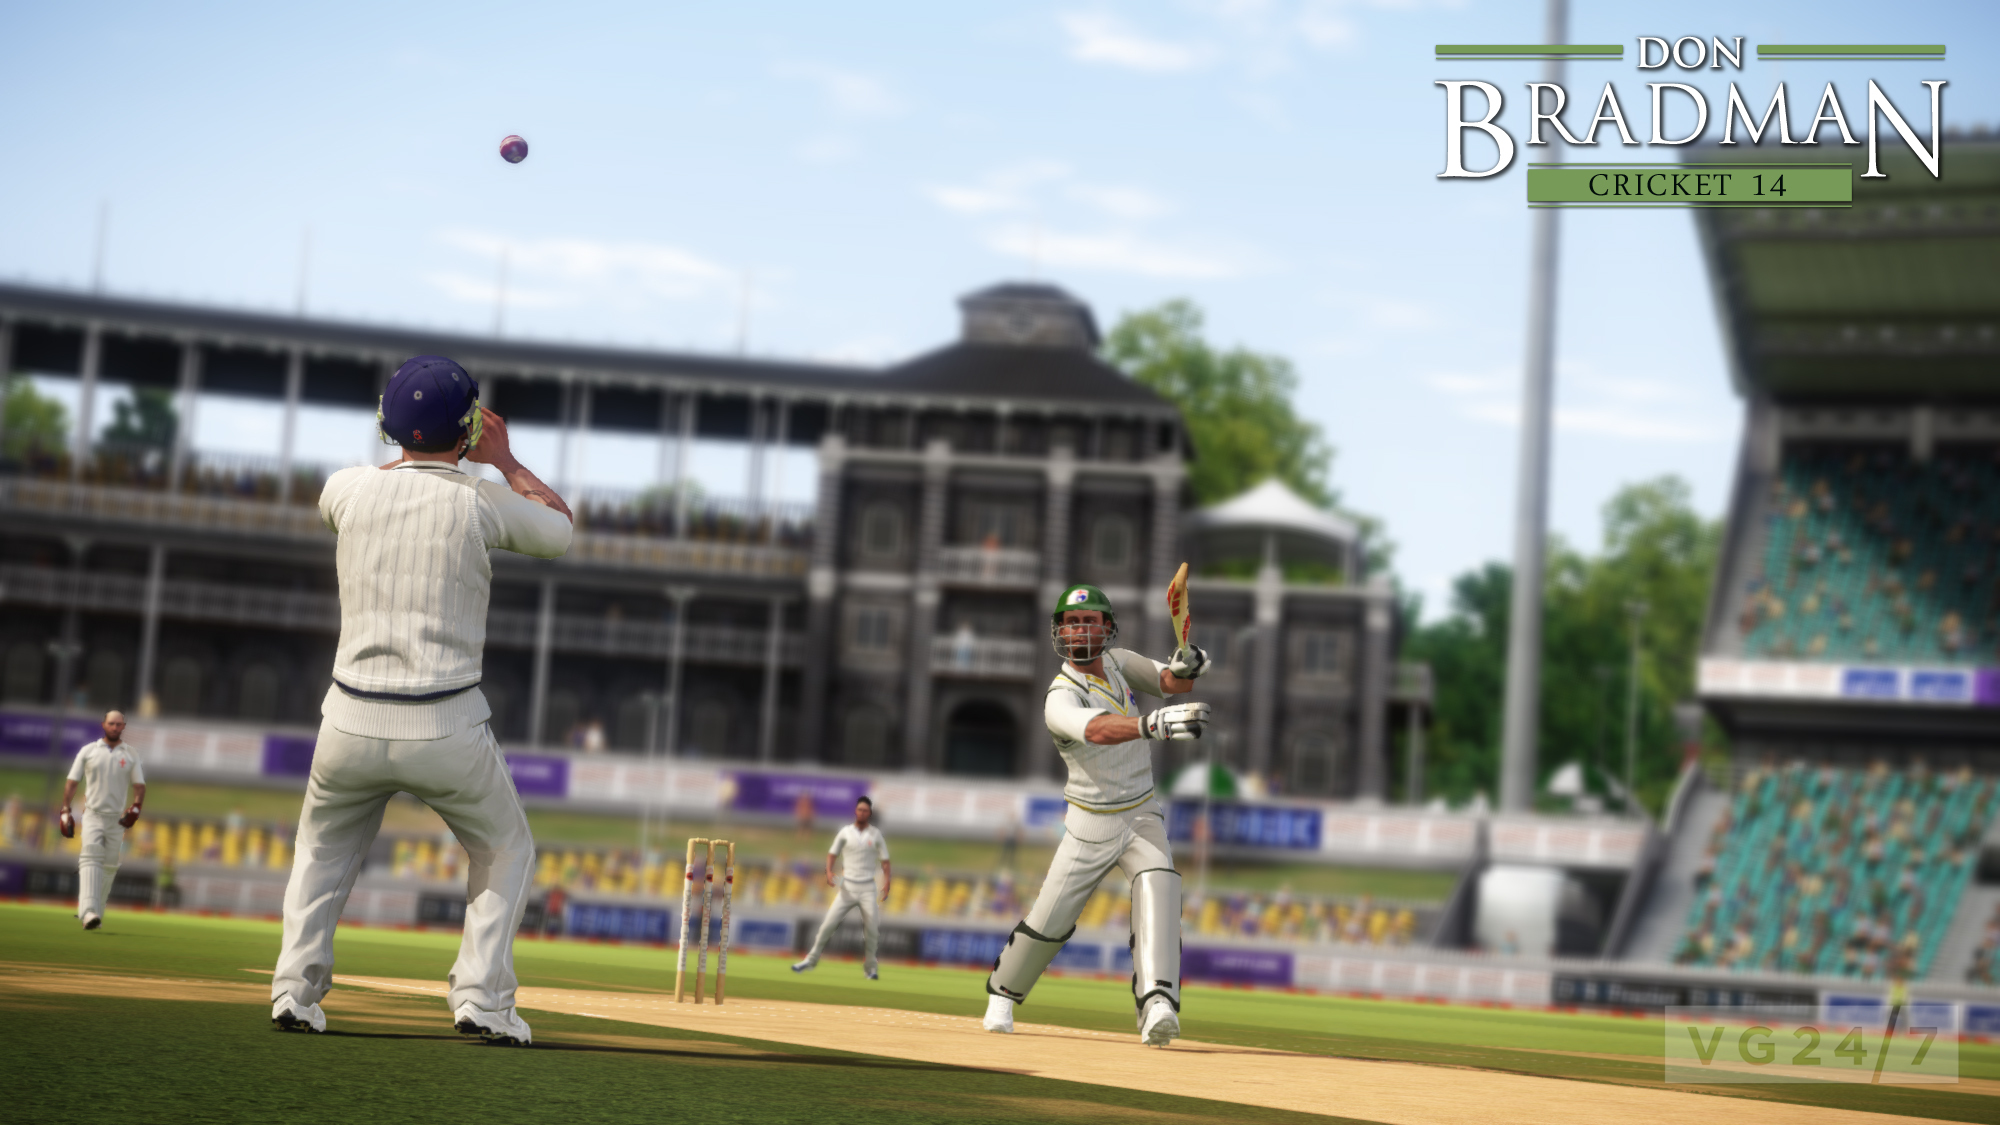 Don Bradman Cricket 14 announced for PS3, PC & Xbox 360 | VG247